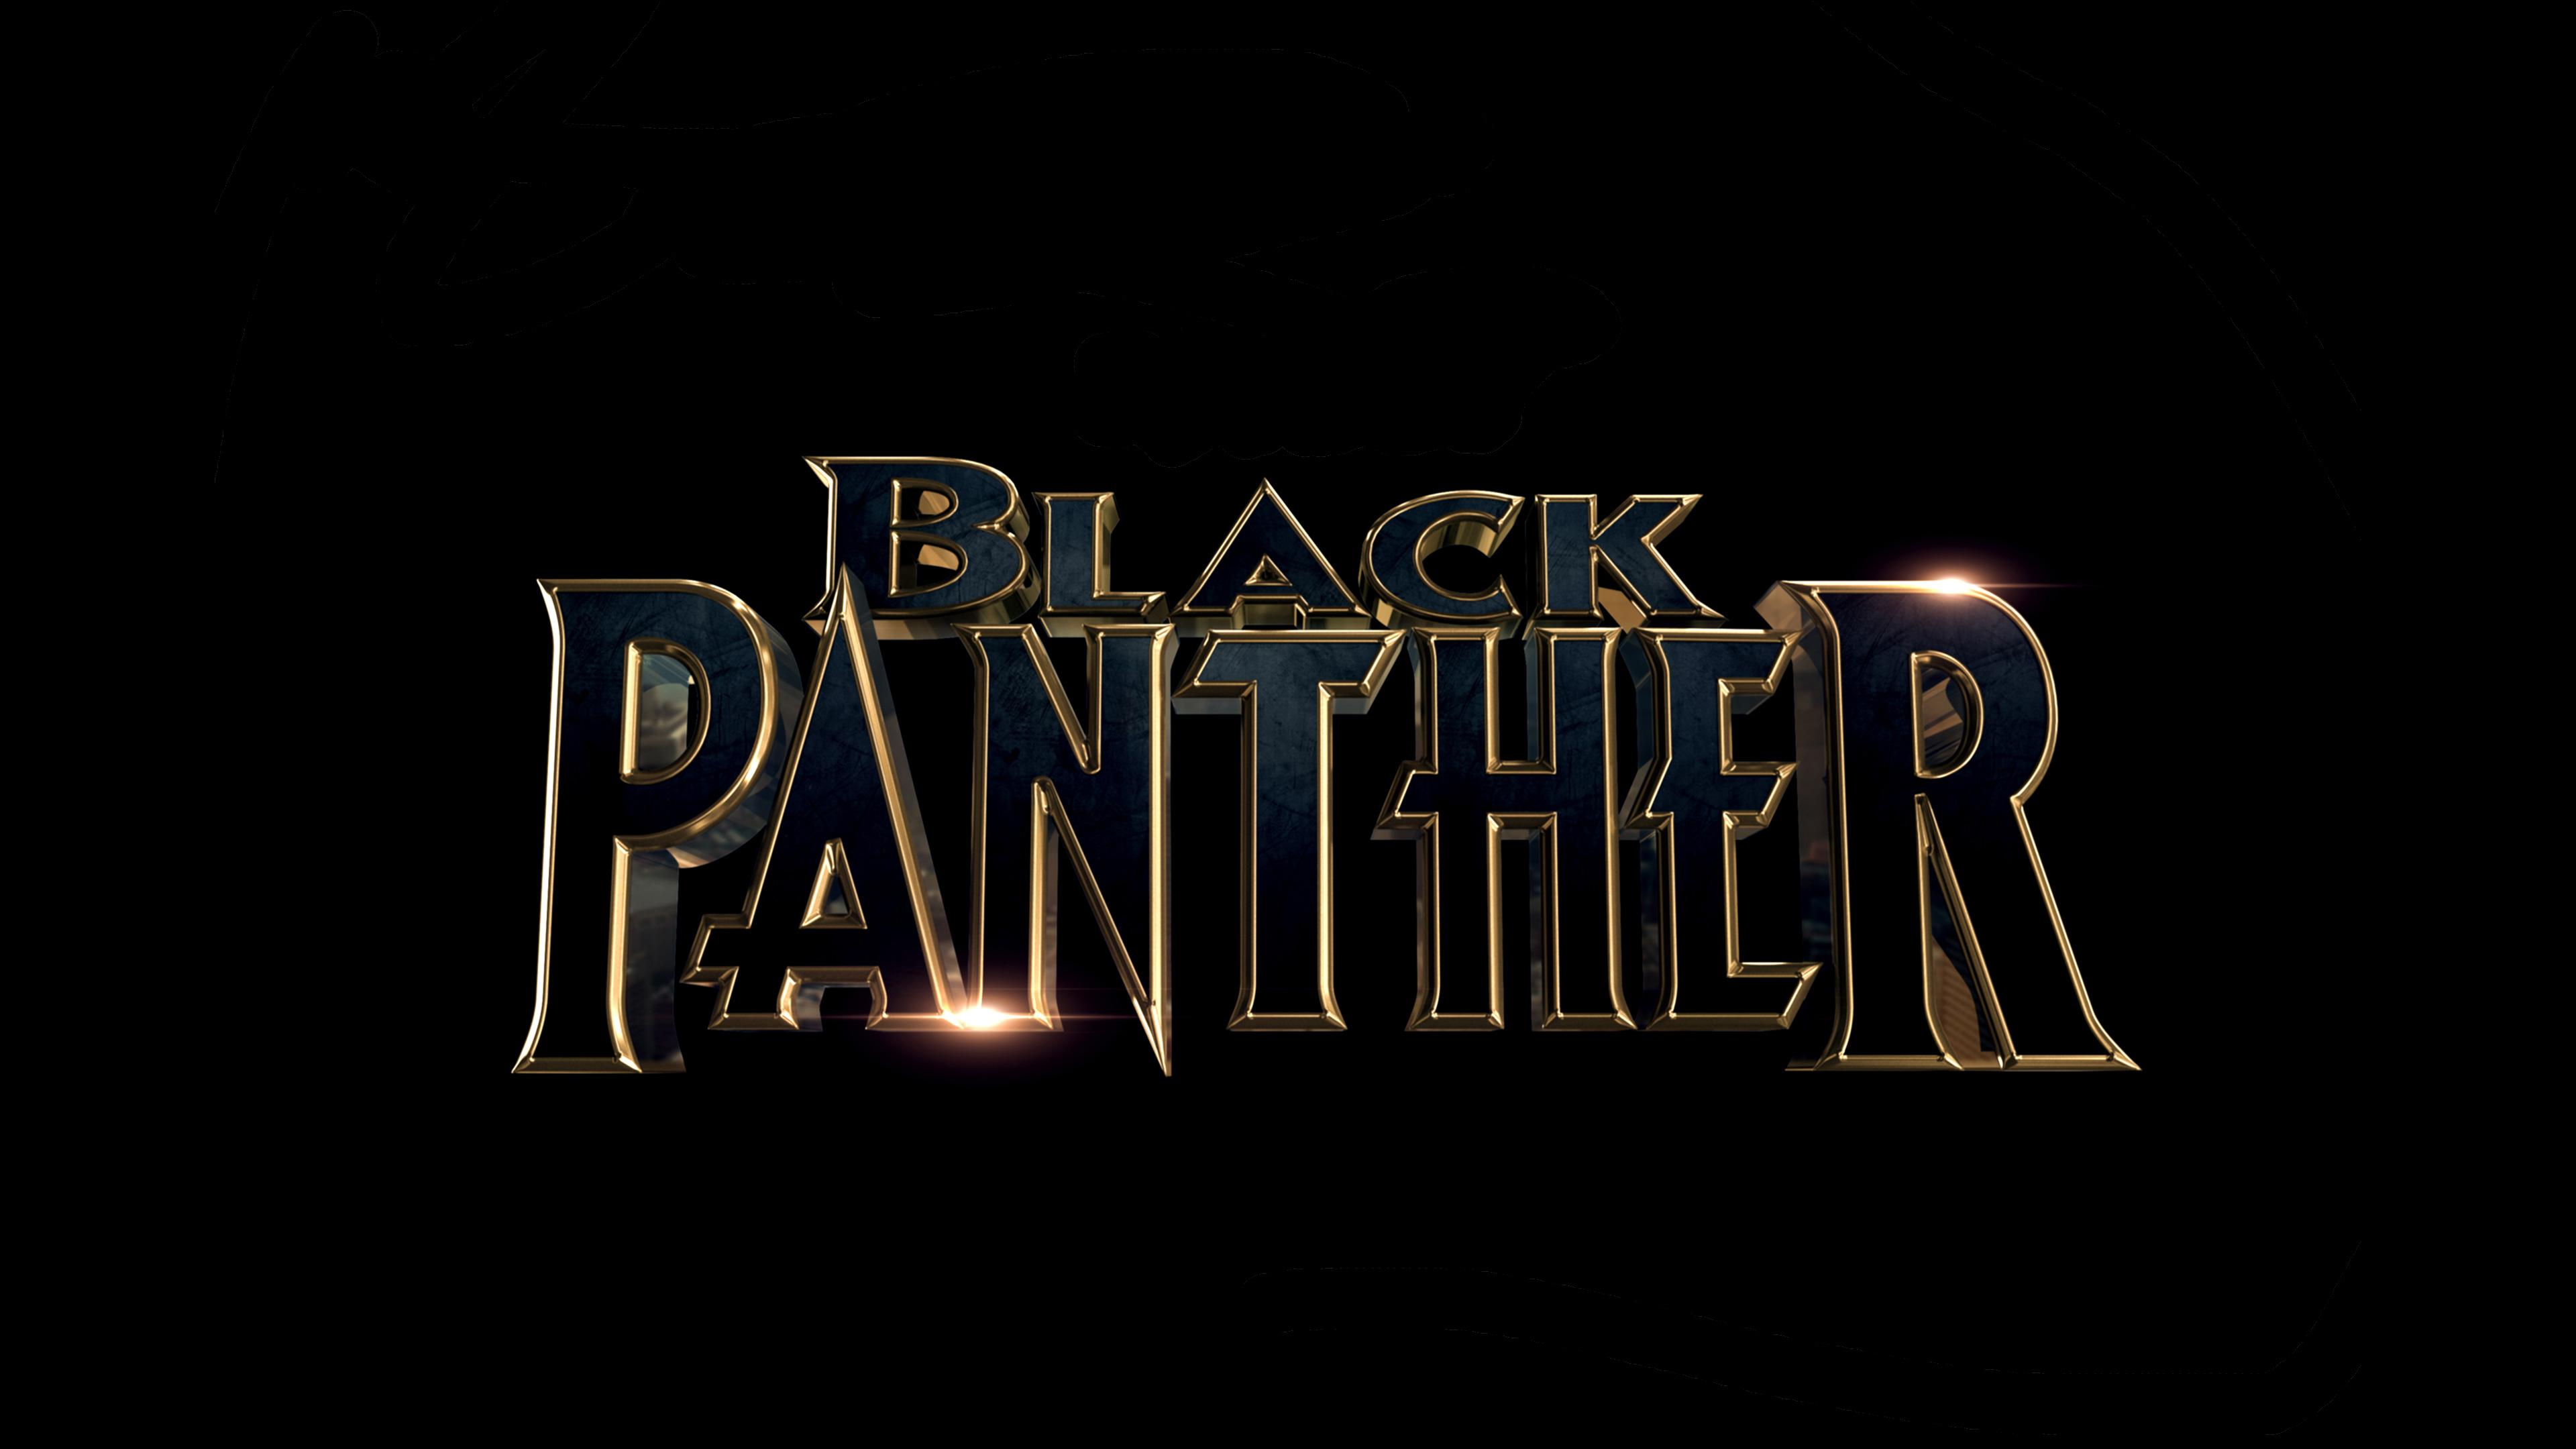 black panther 2018 movie 1536401336 - Black Panther 2018 Movie - movies wallpapers, logo wallpapers, black panther wallpapers, 4k-wallpapers, 2018-movies-wallpapers